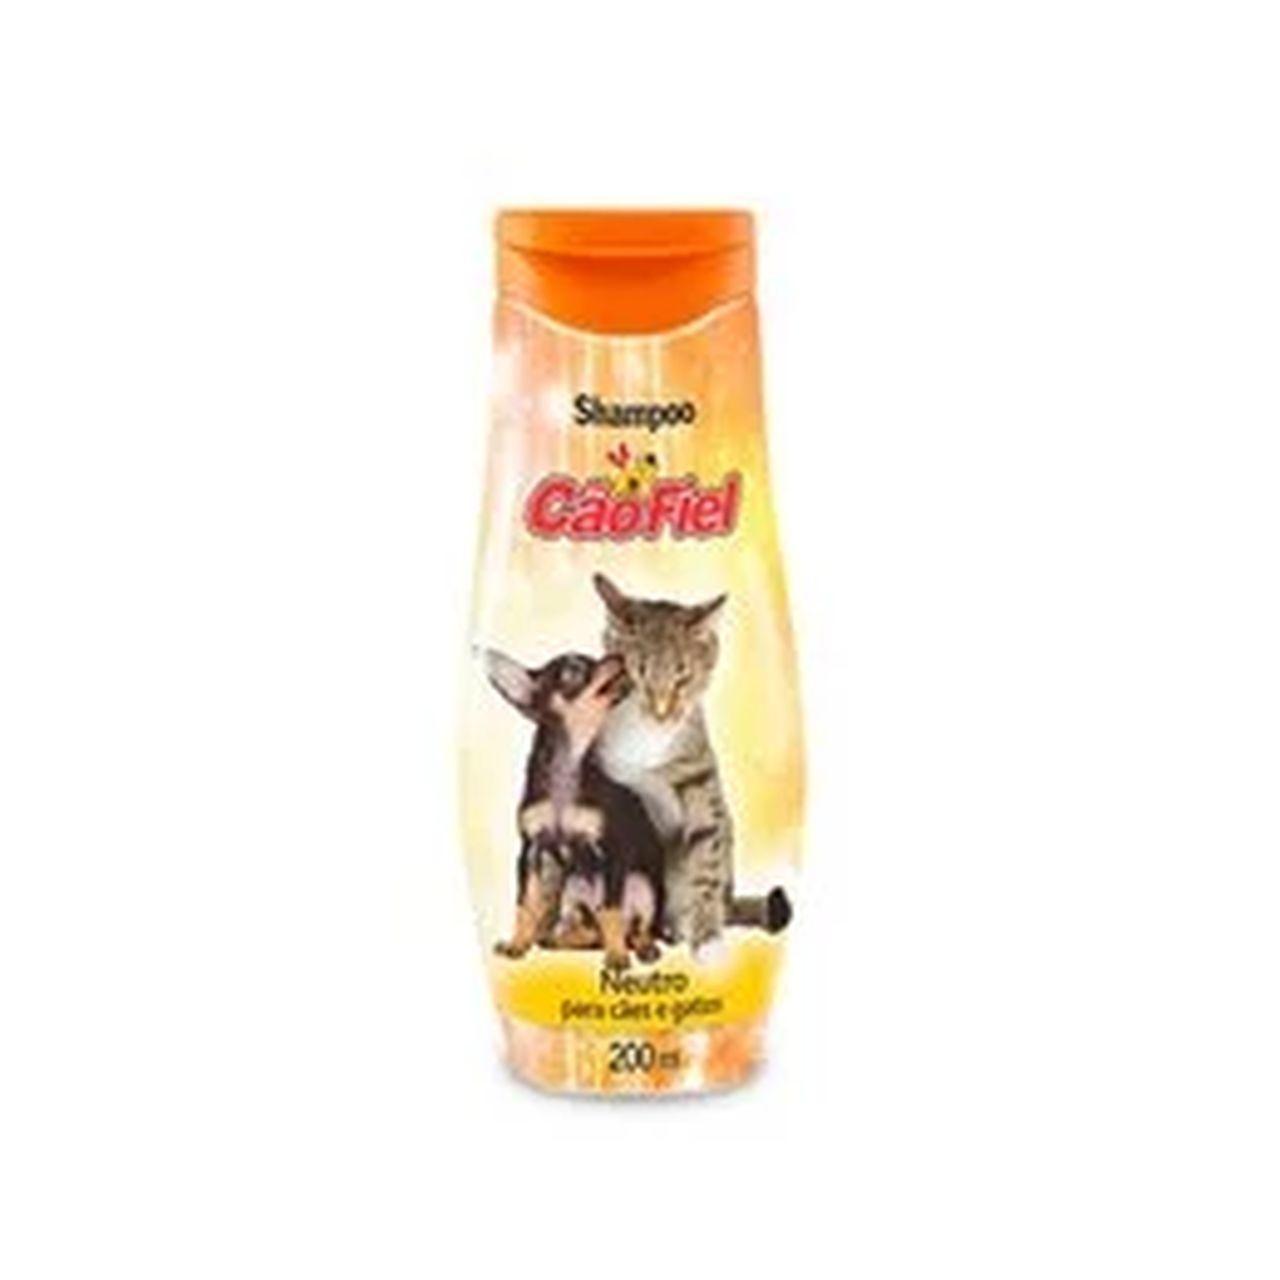 Shampoo Cão Fiel Neutro - 200 mL